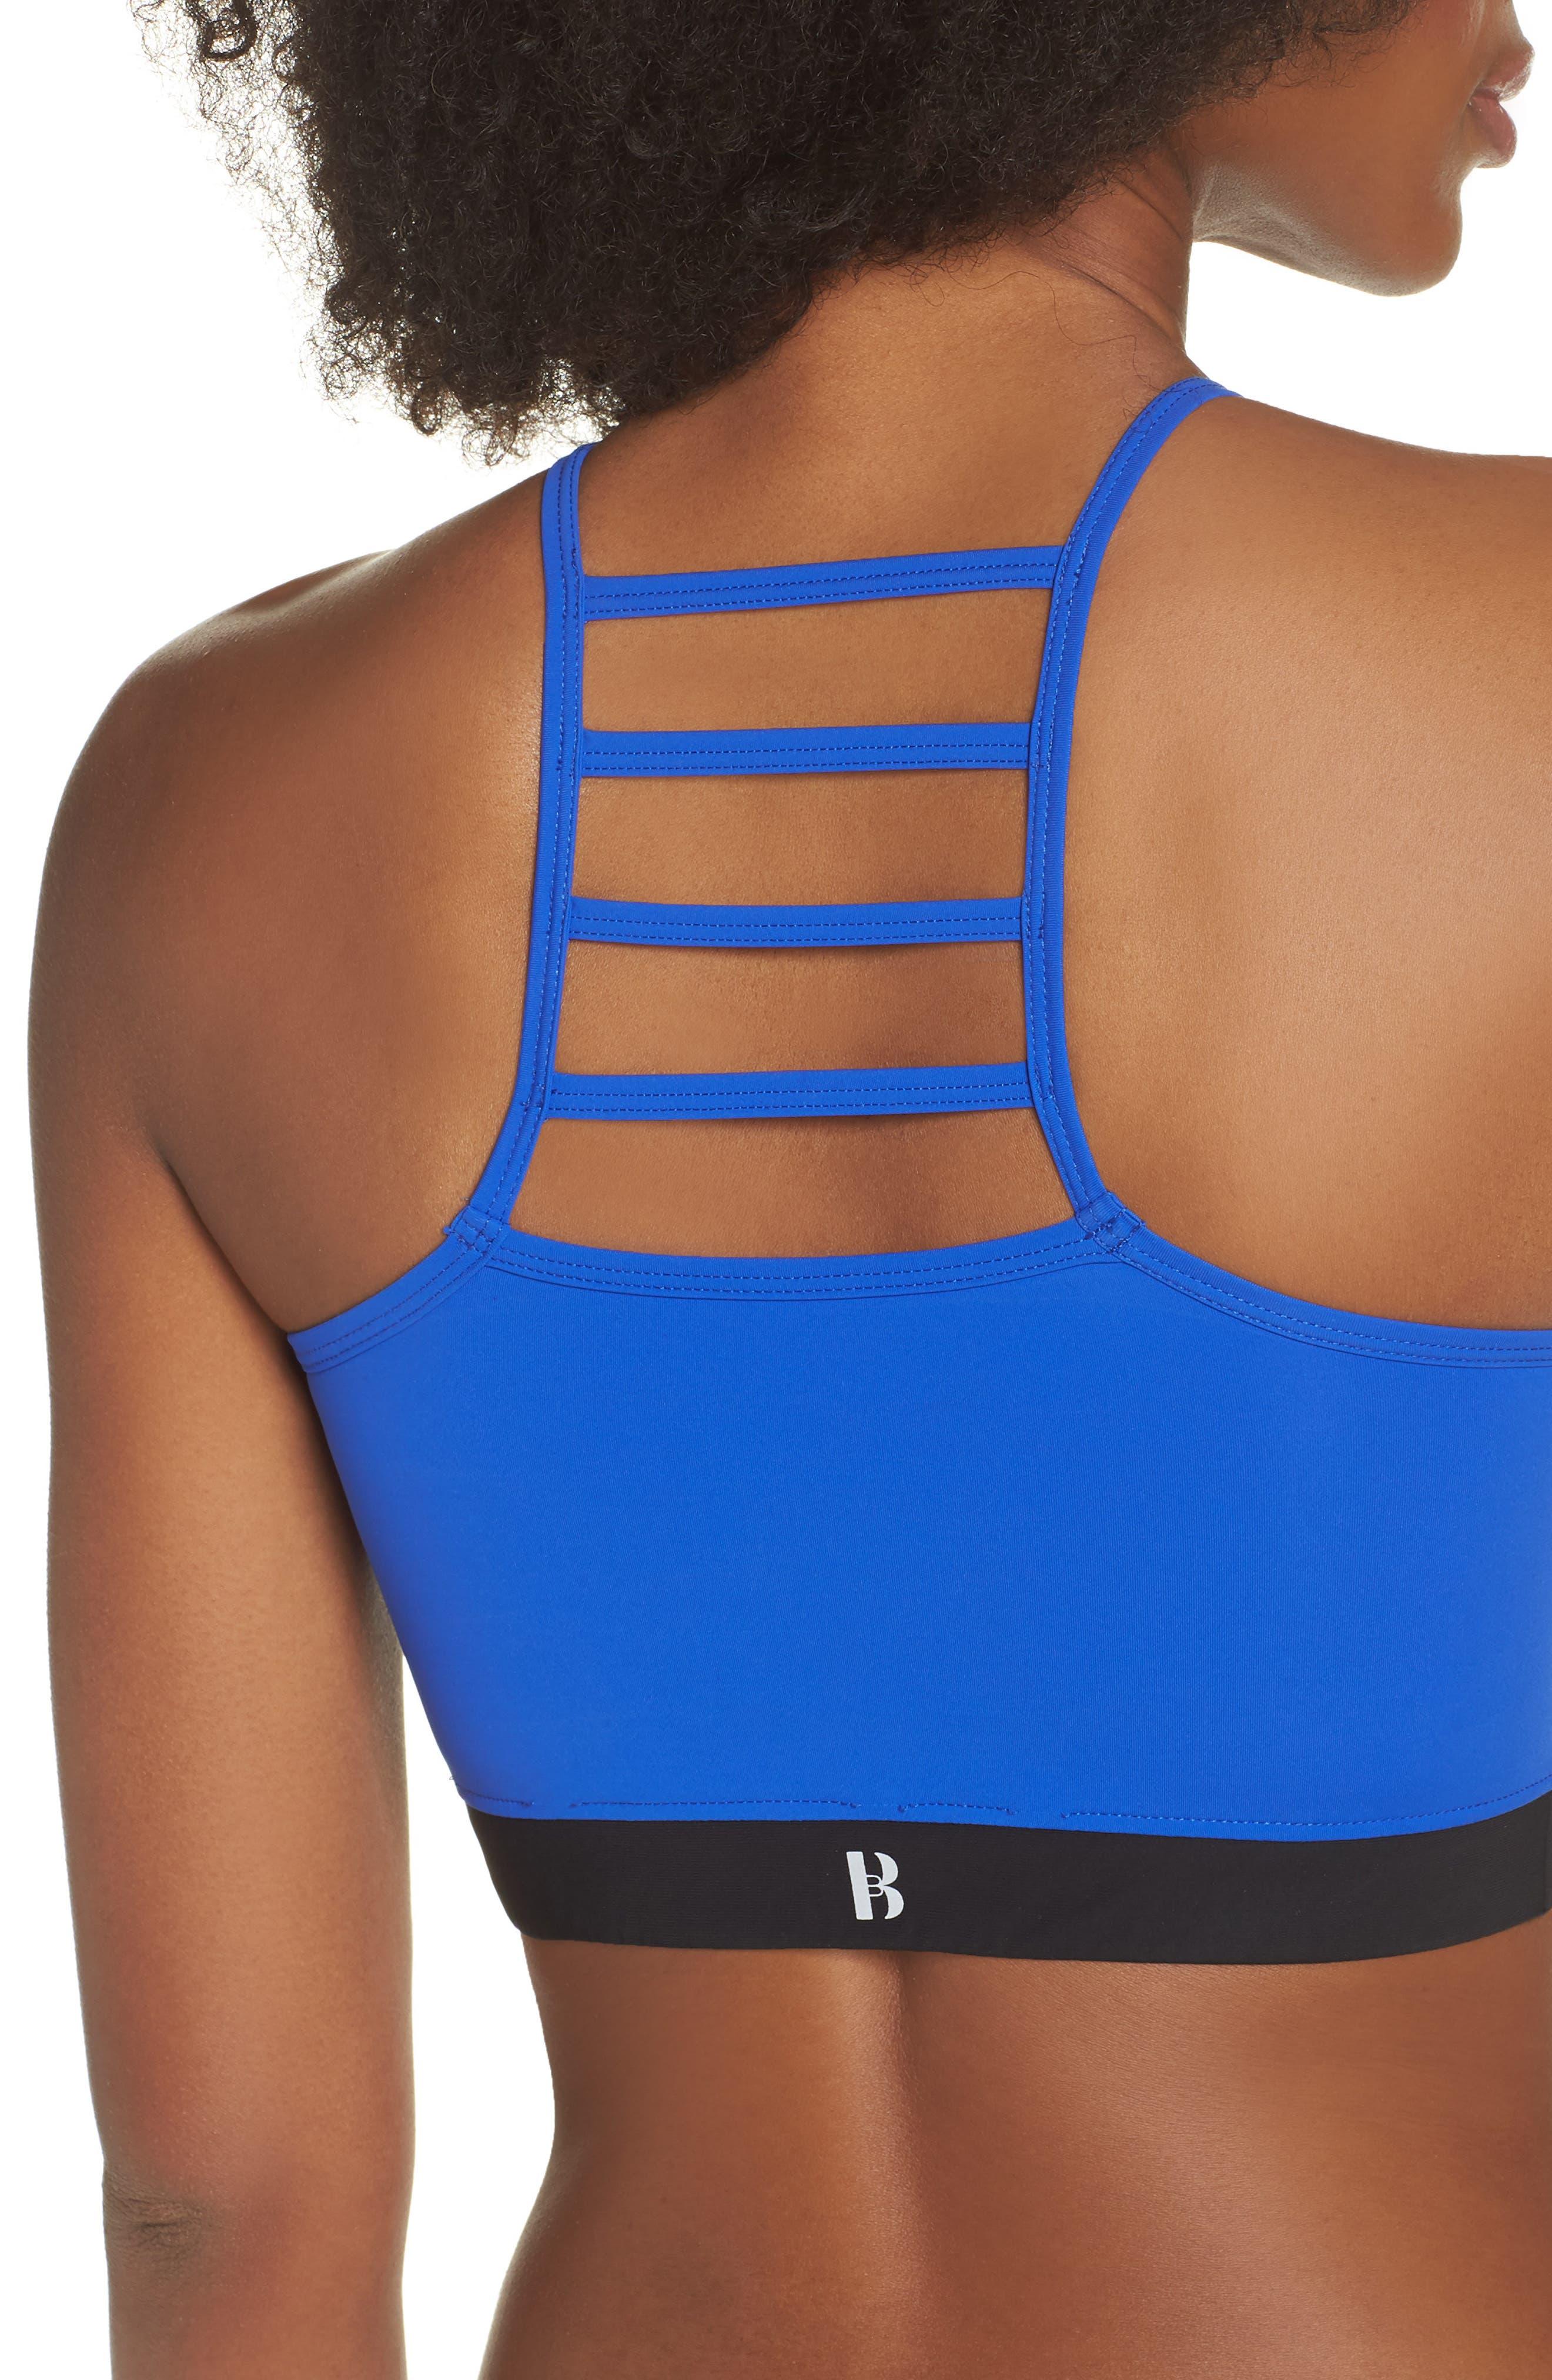 BoomBoom Athletica Cutaway Halter Bra,                             Alternate thumbnail 4, color,                             Electric Blue/ Black